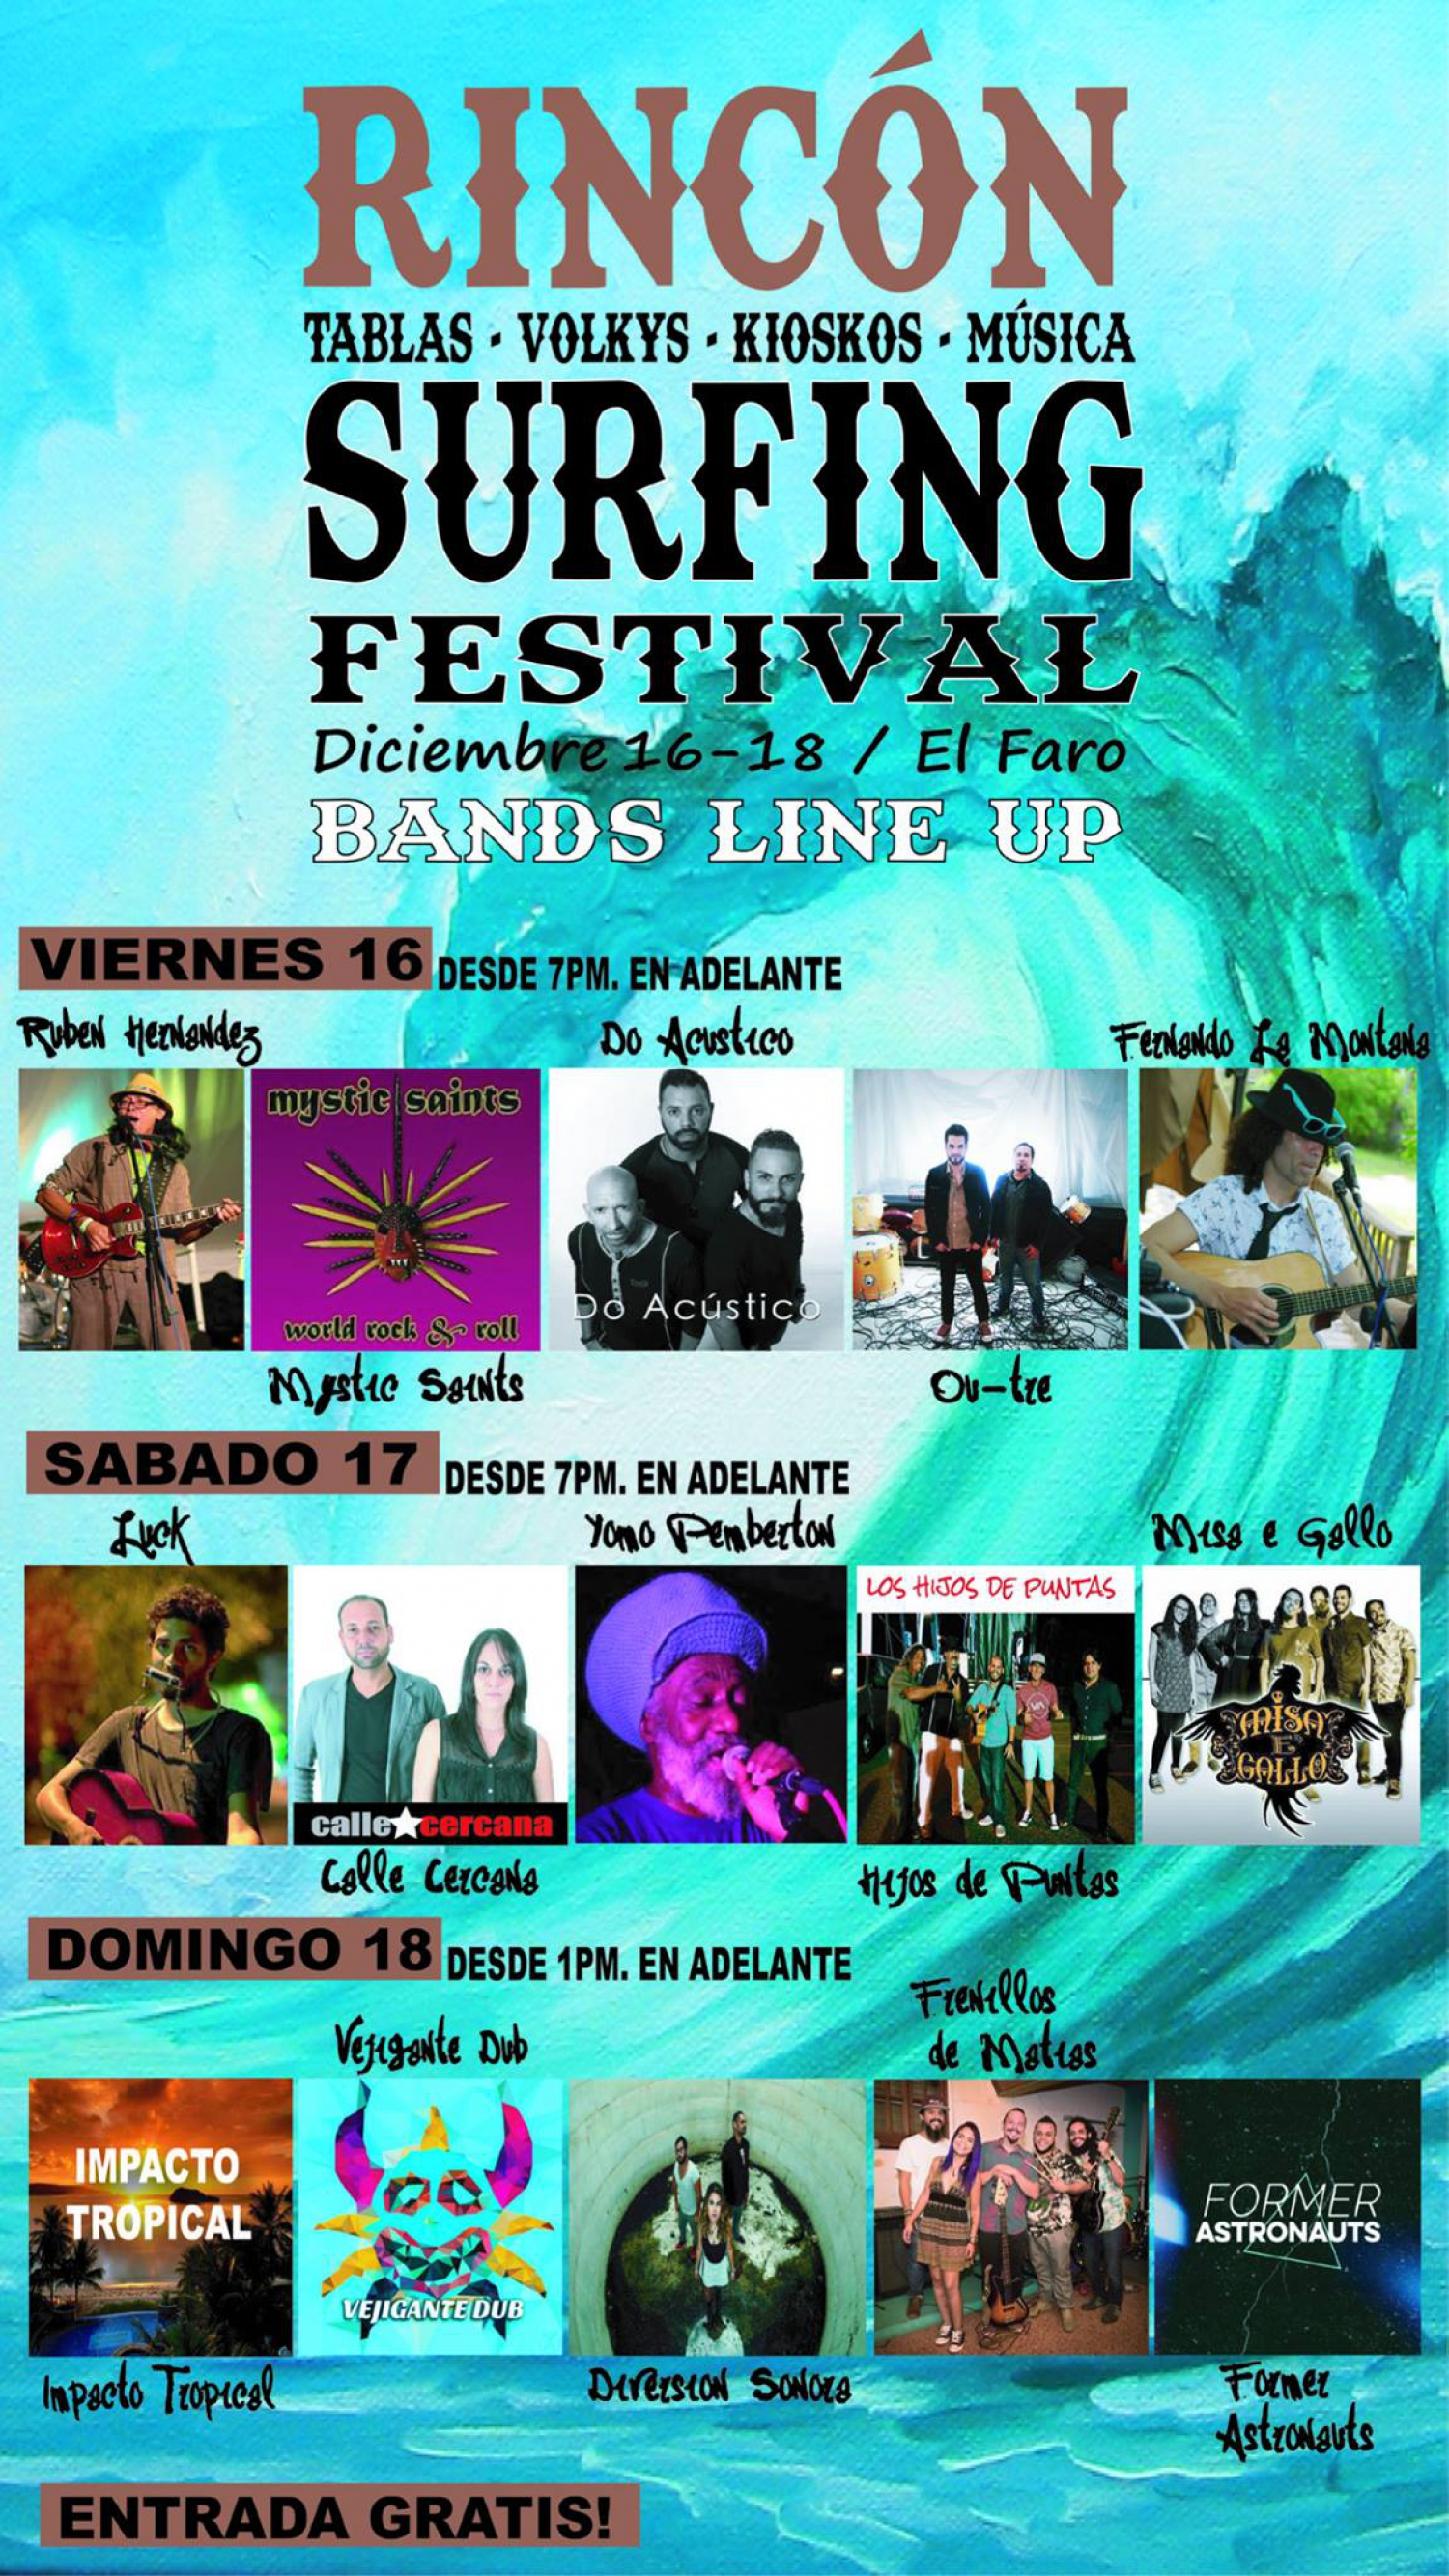 rincon-surfing-festival-flyer